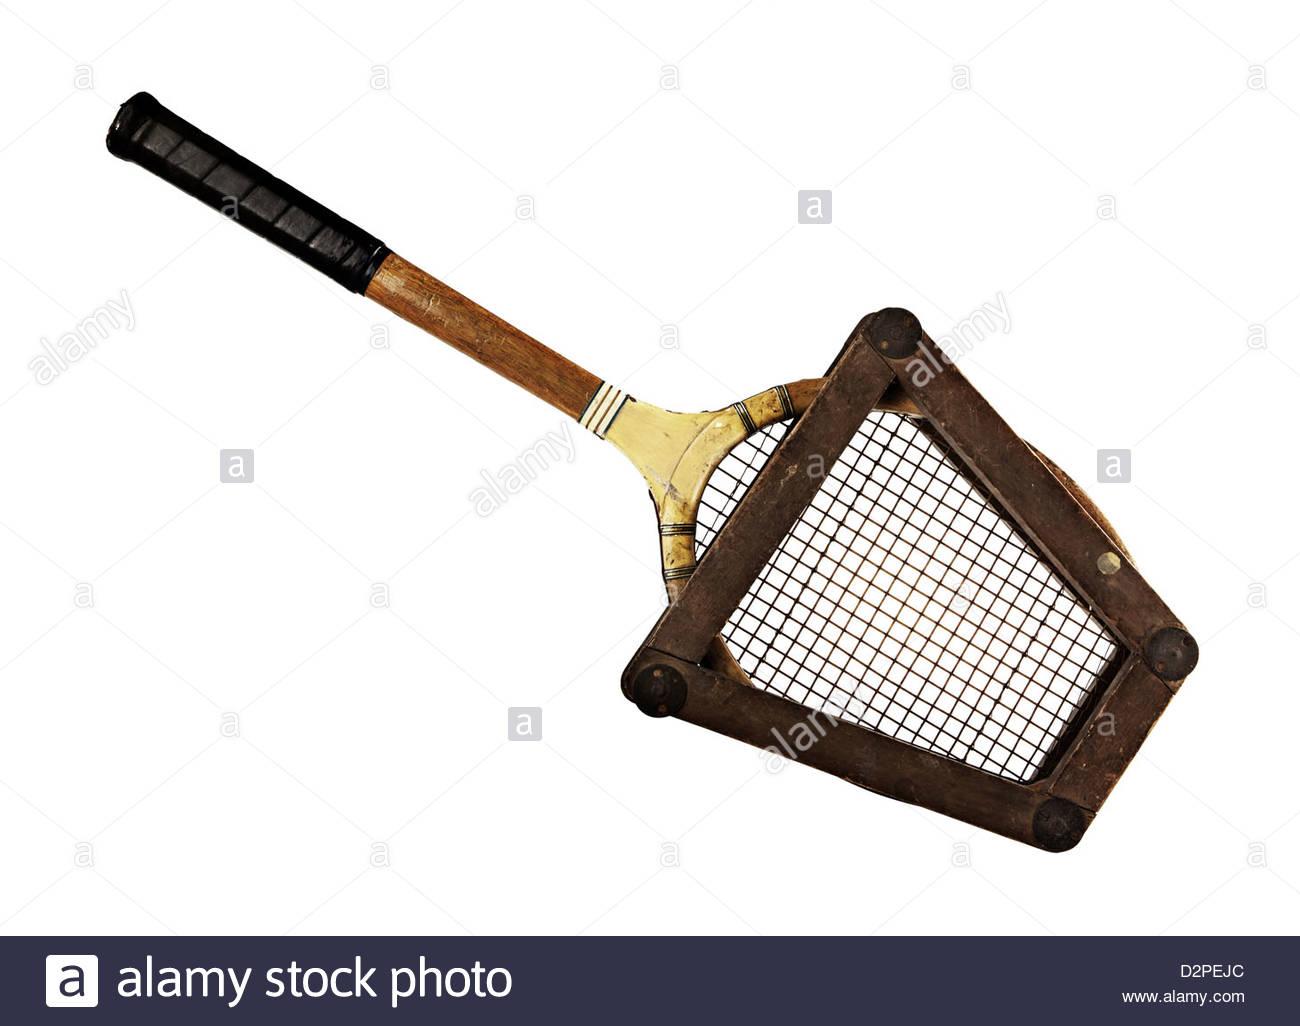 hölzernen Tennisschläger im Rahmen Stockfoto, Bild: 53354852 - Alamy